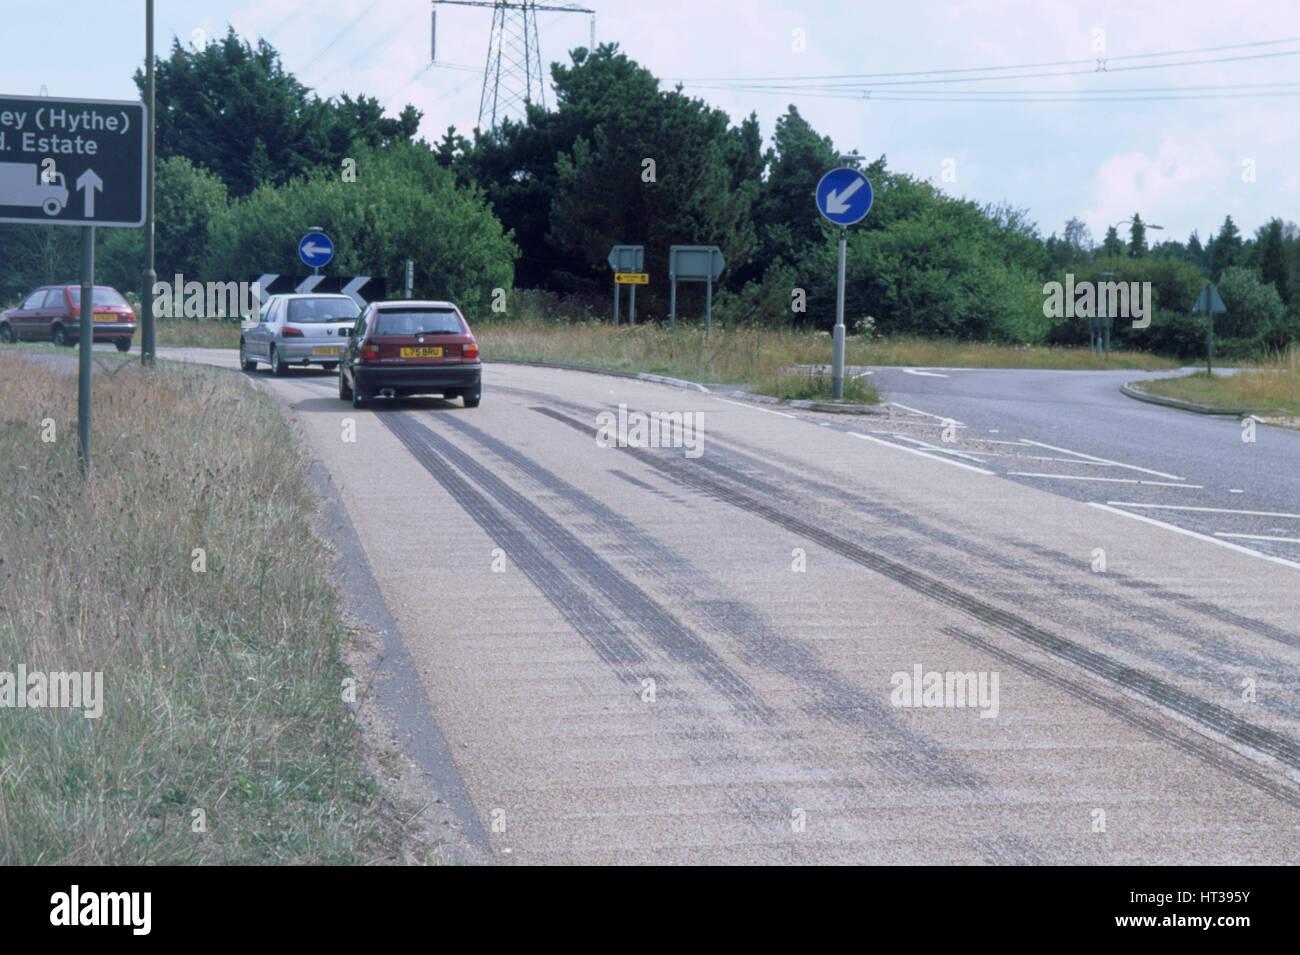 Reifen Skidmarks auf Fahrbahn. Künstler: unbekannt. Stockbild